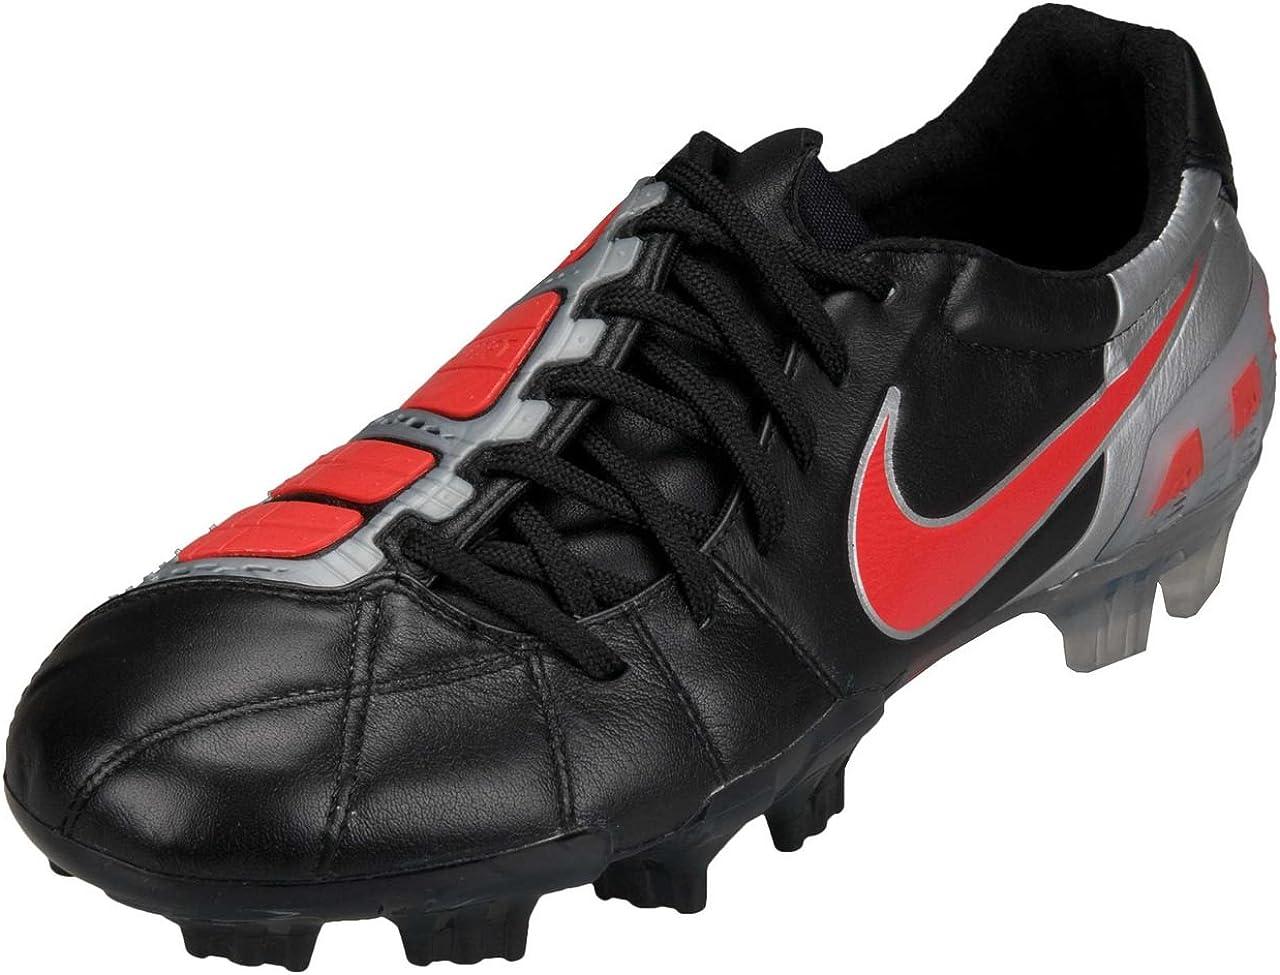 Nike Total 90 Laser III K Fg: Amazon.it: Scarpe e borse